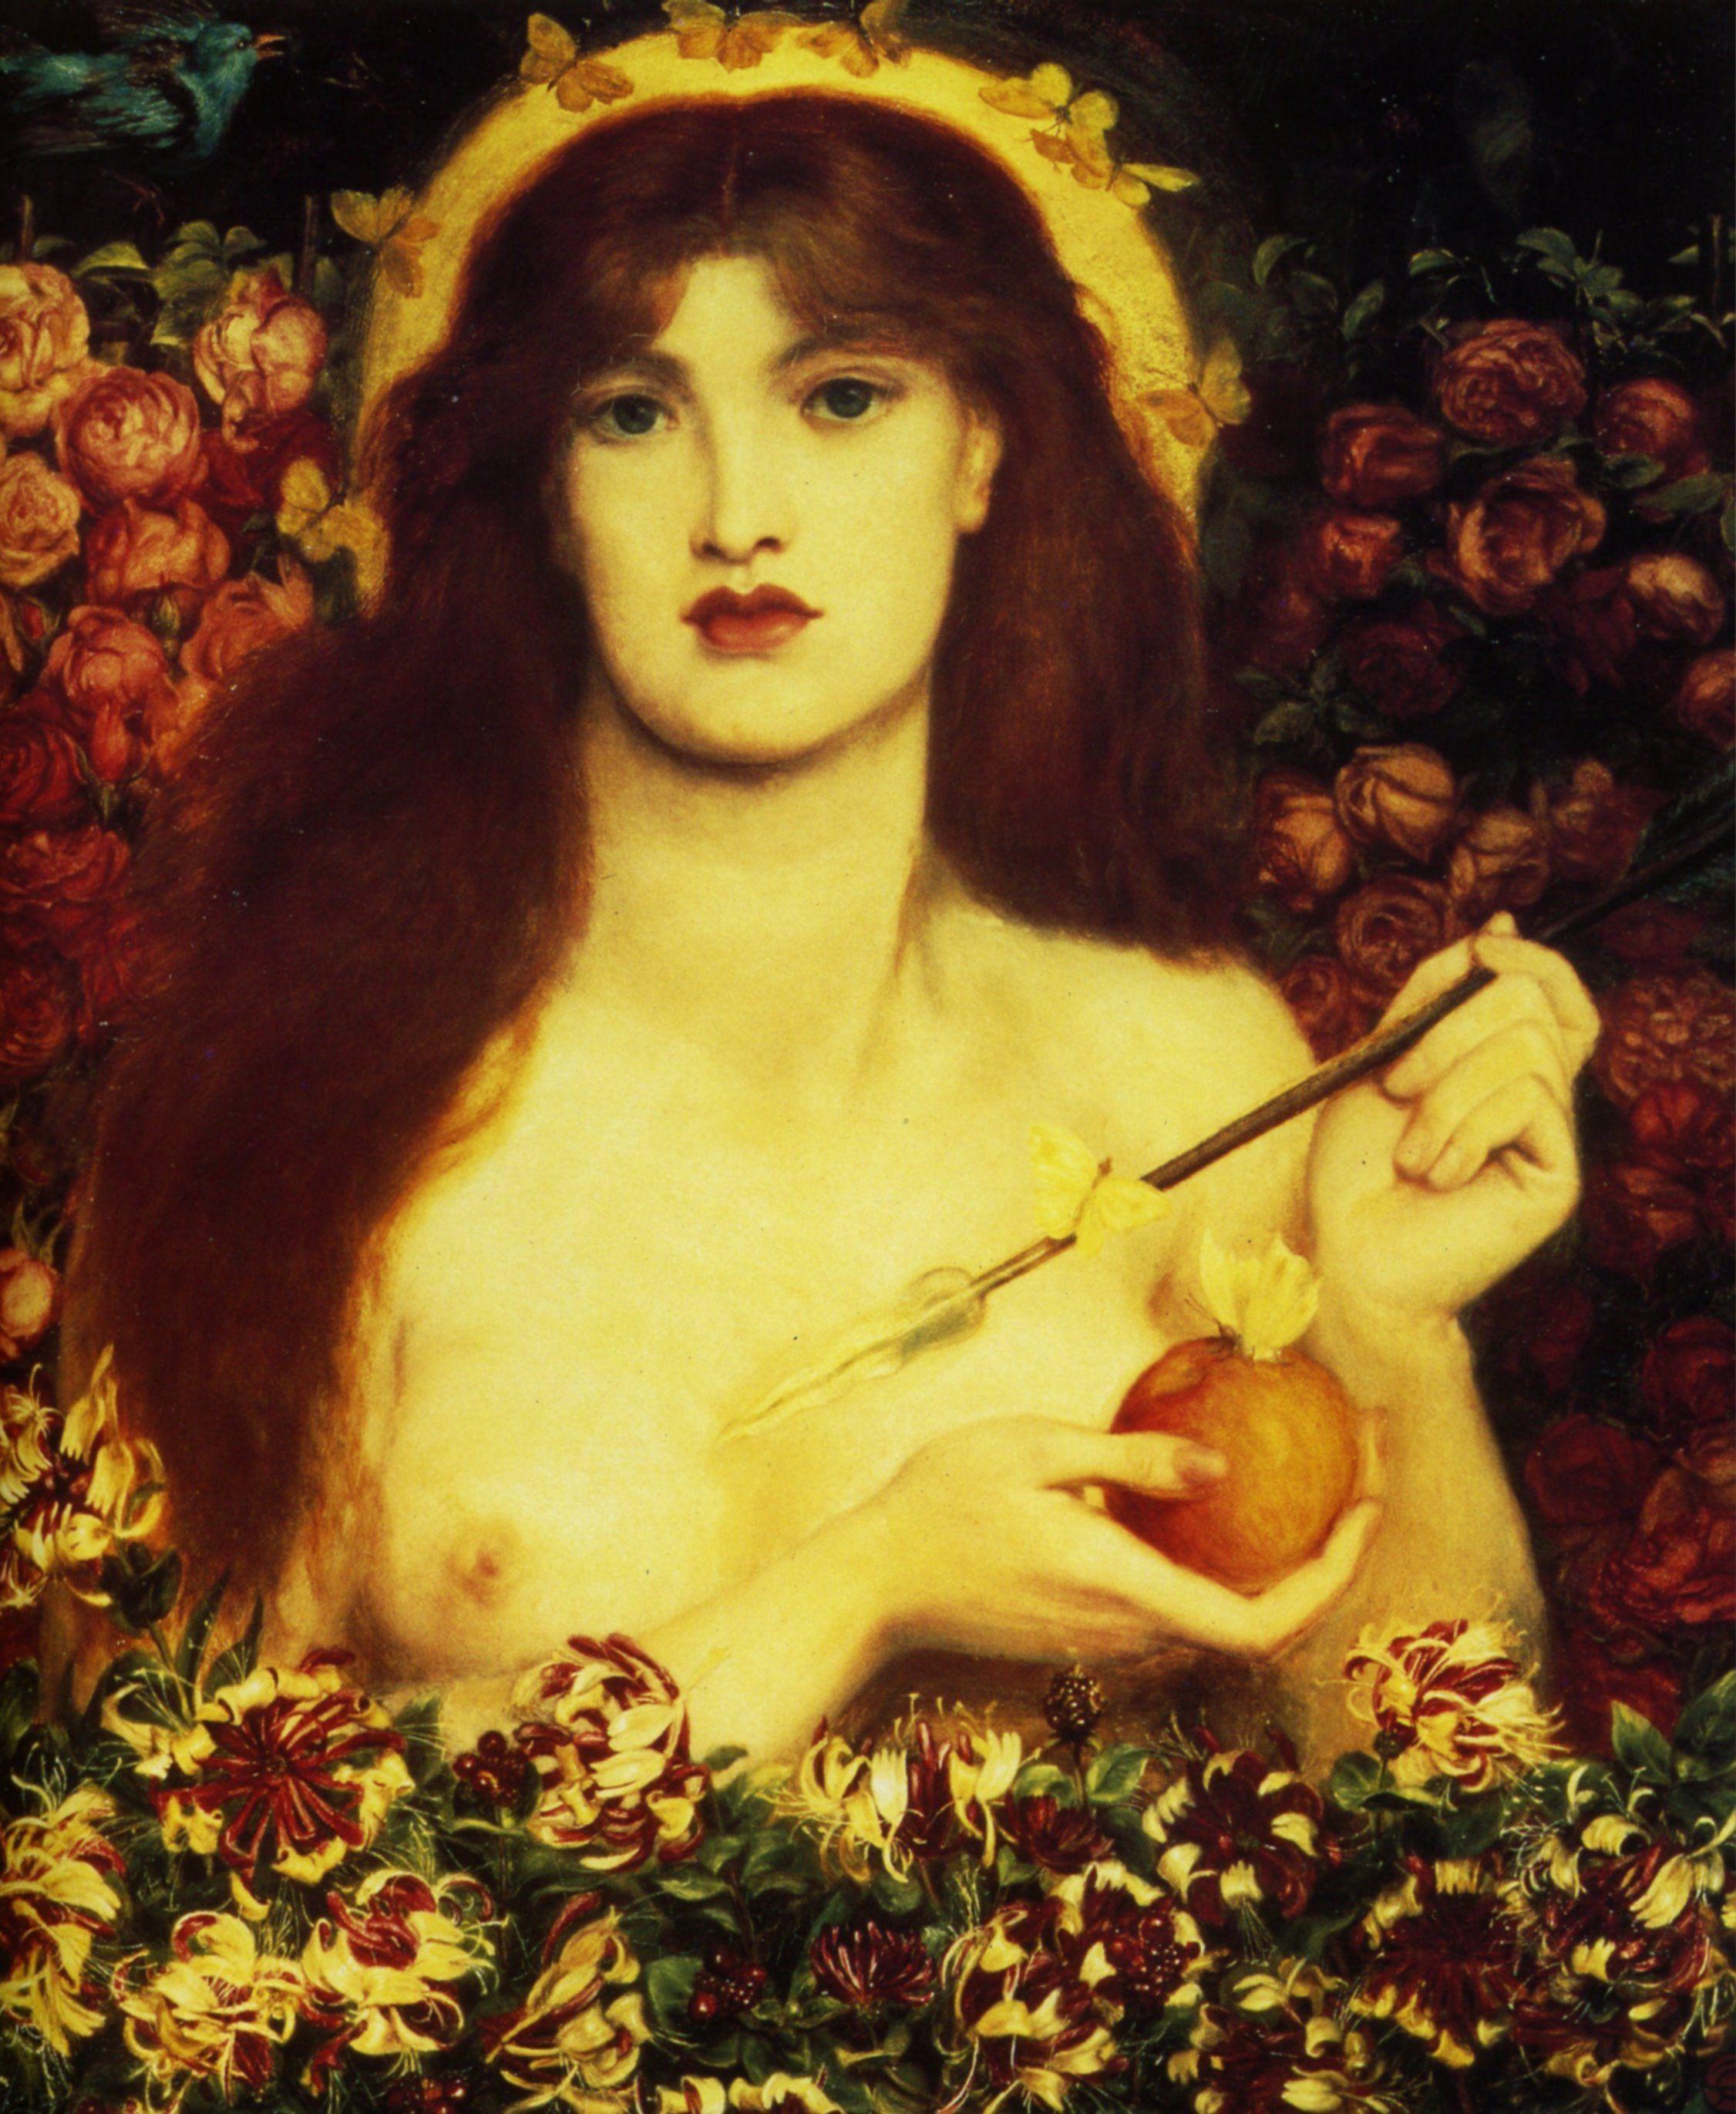 Rossetti various sizes Venus Verticordia fine art giclee print poster